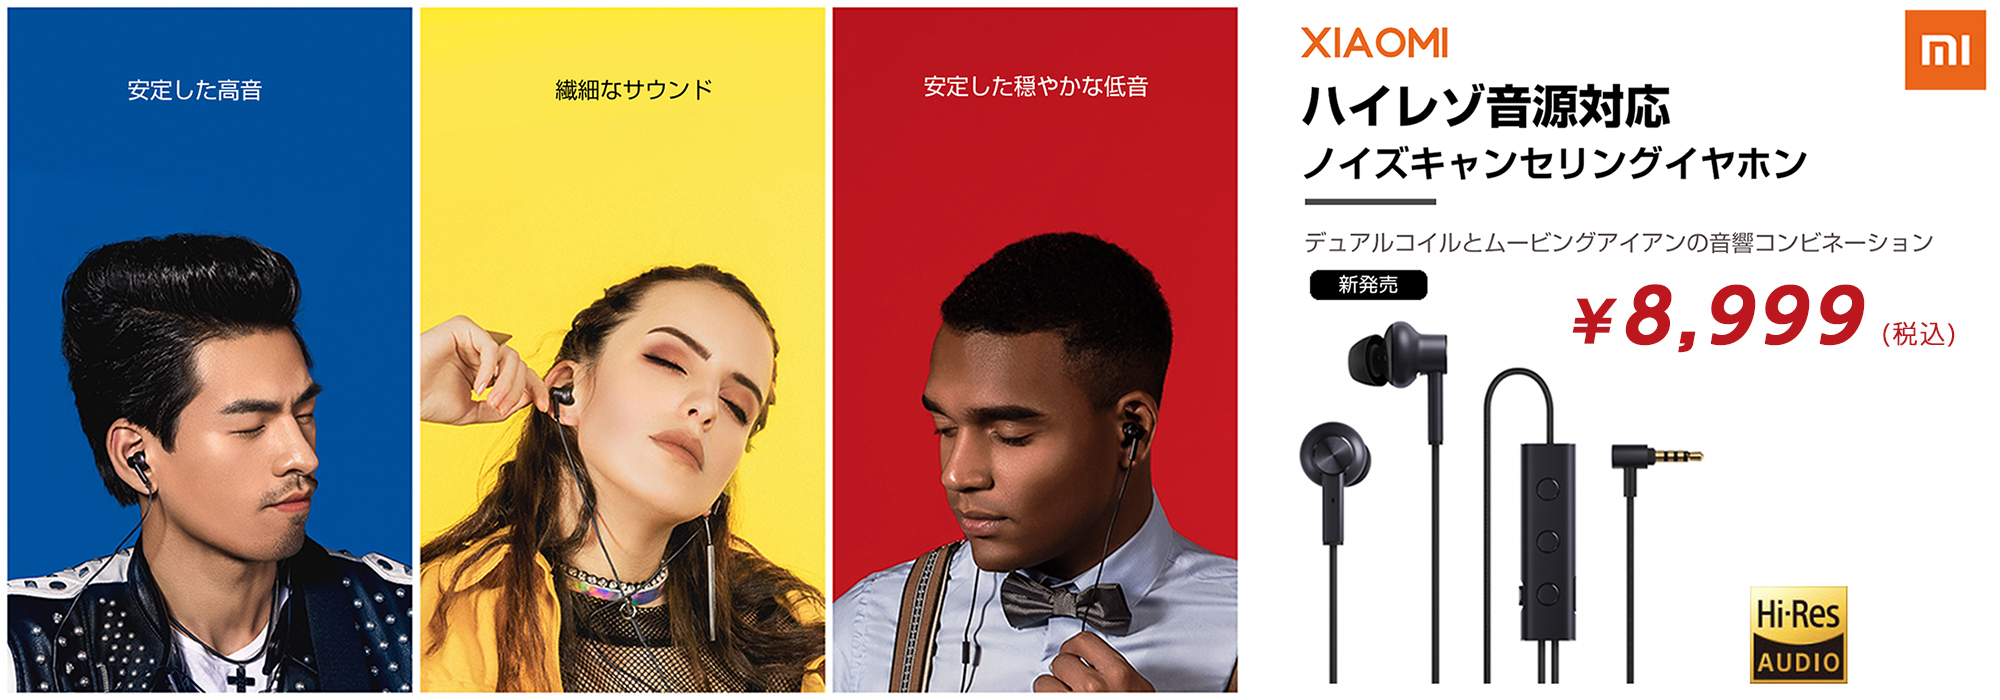 Xiaomi ワイヤレスイヤホン